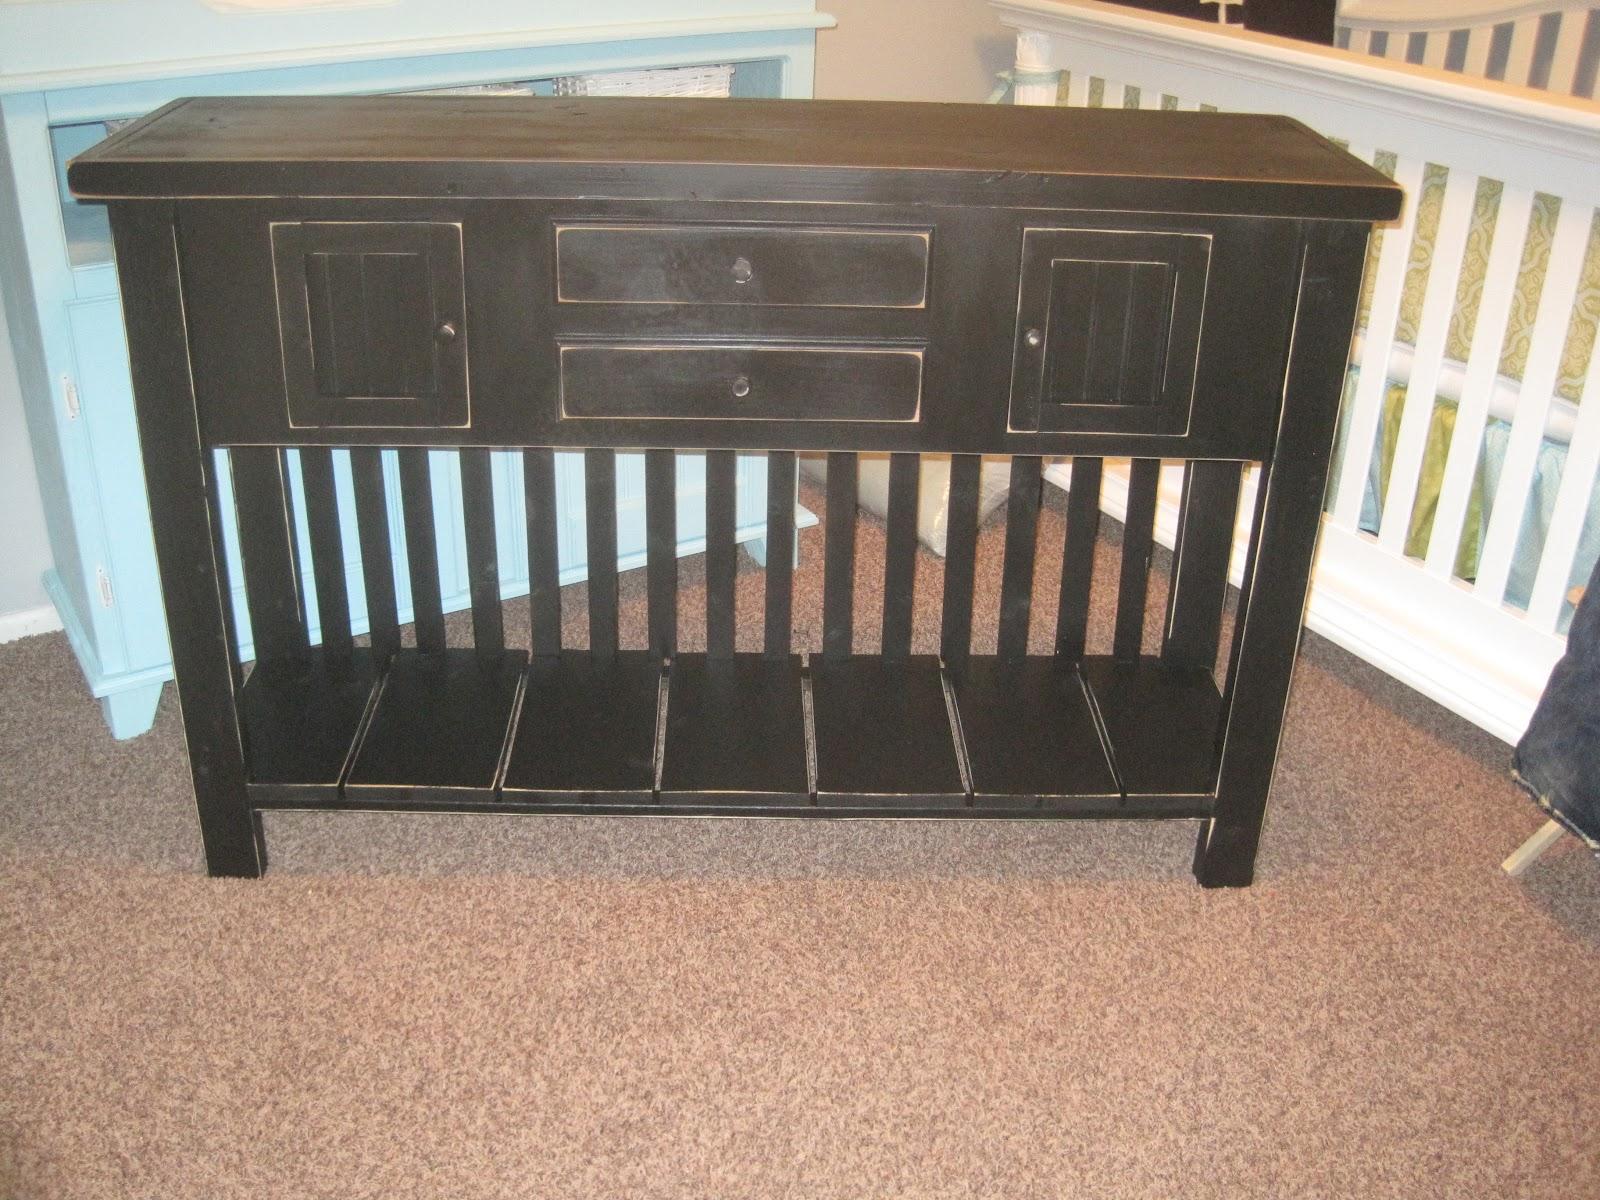 hand crafted furniture black 4 door entry table. Black Bedroom Furniture Sets. Home Design Ideas